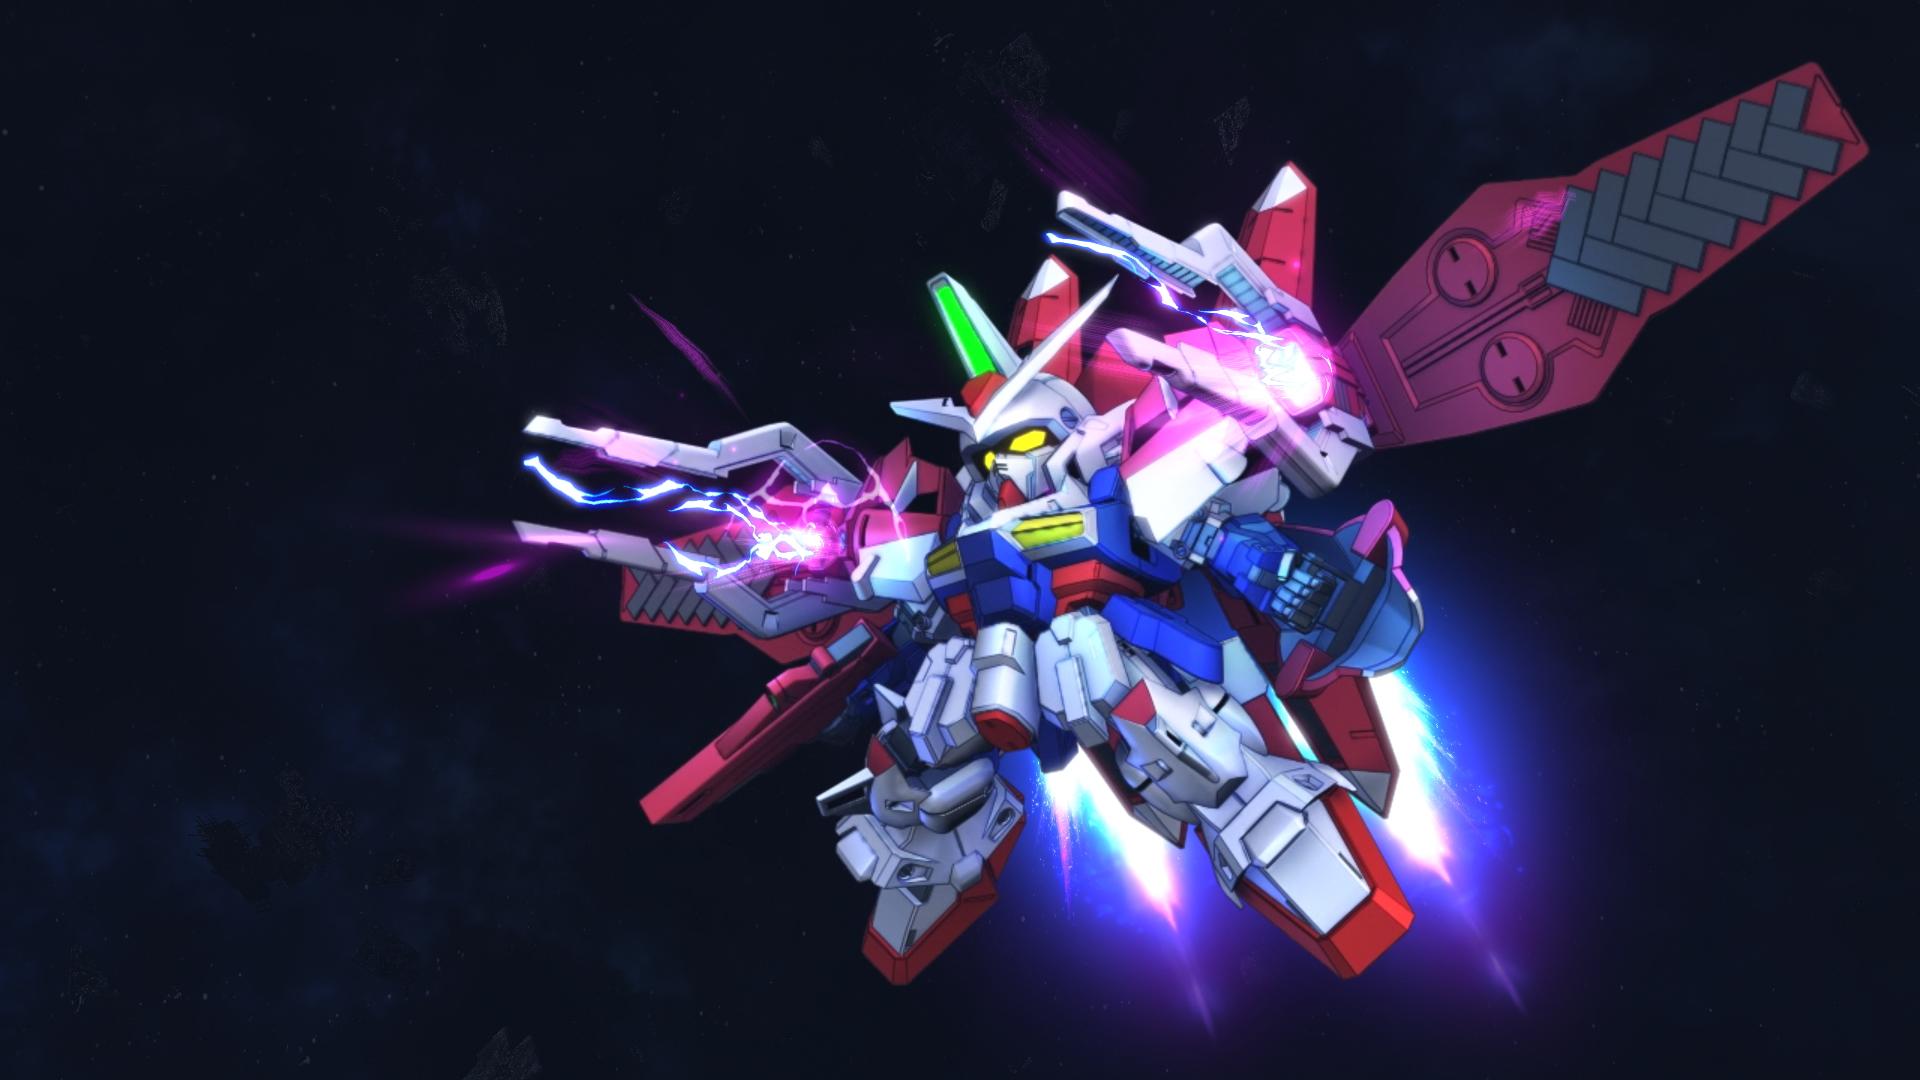 SD Gundam G Generation Cross Rays 3172019 1